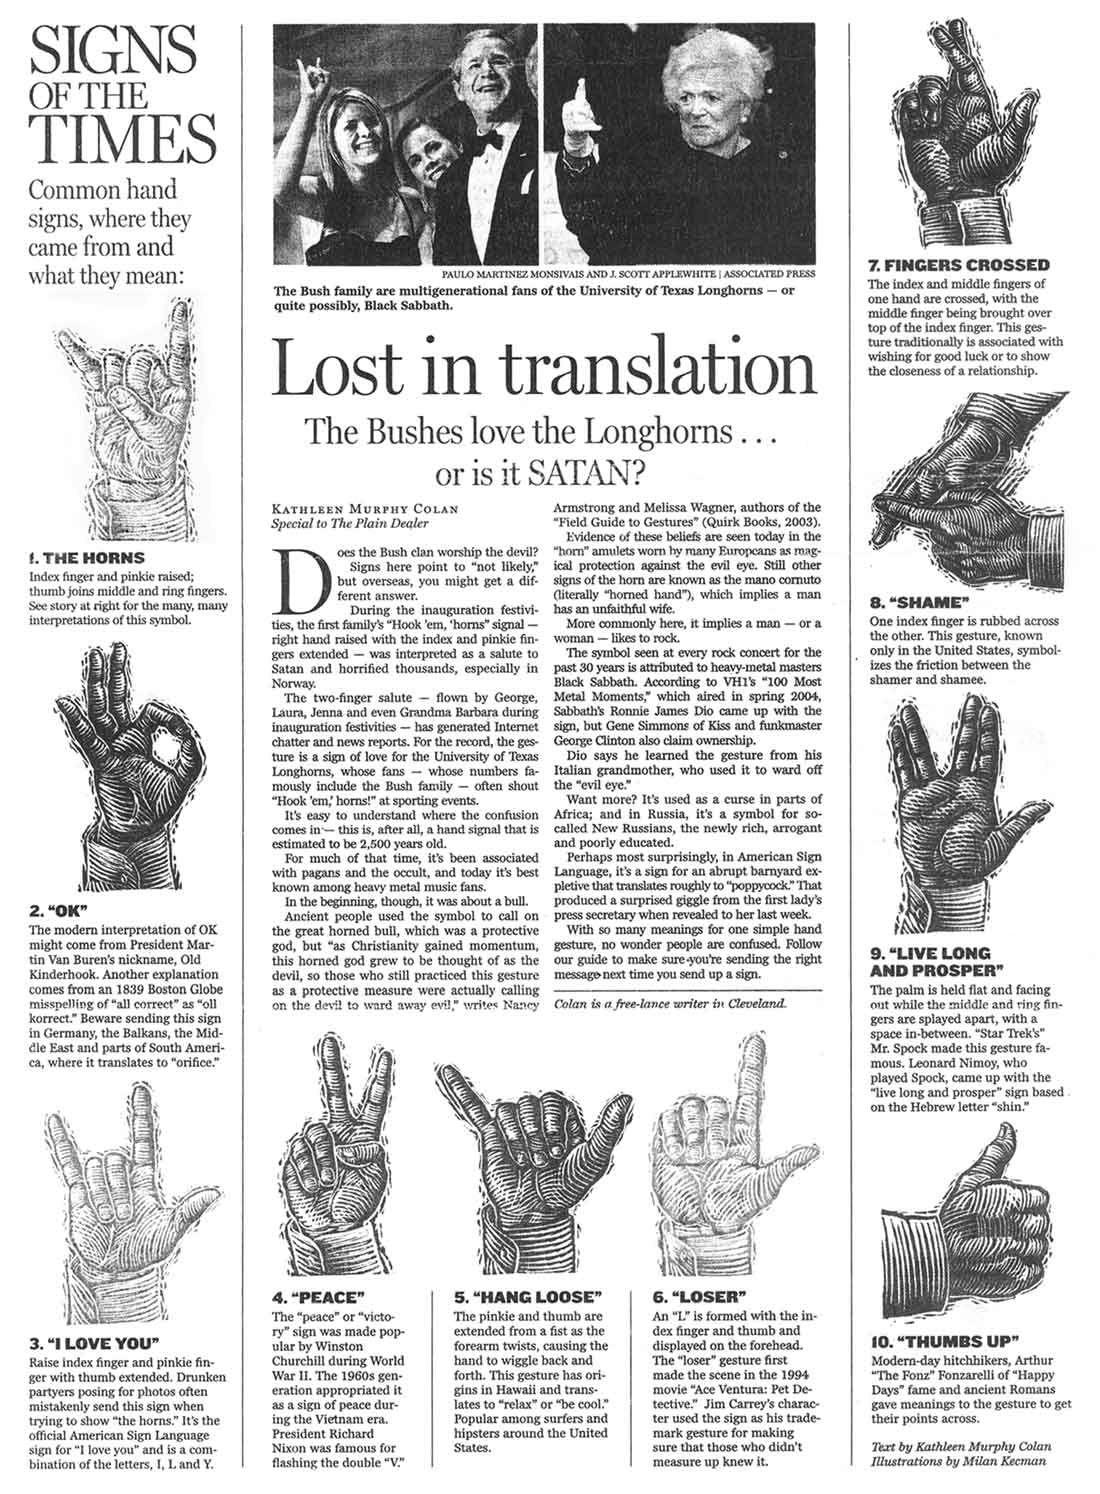 Illuminati Hand Symbols I Know This Sounds Crazy But If You